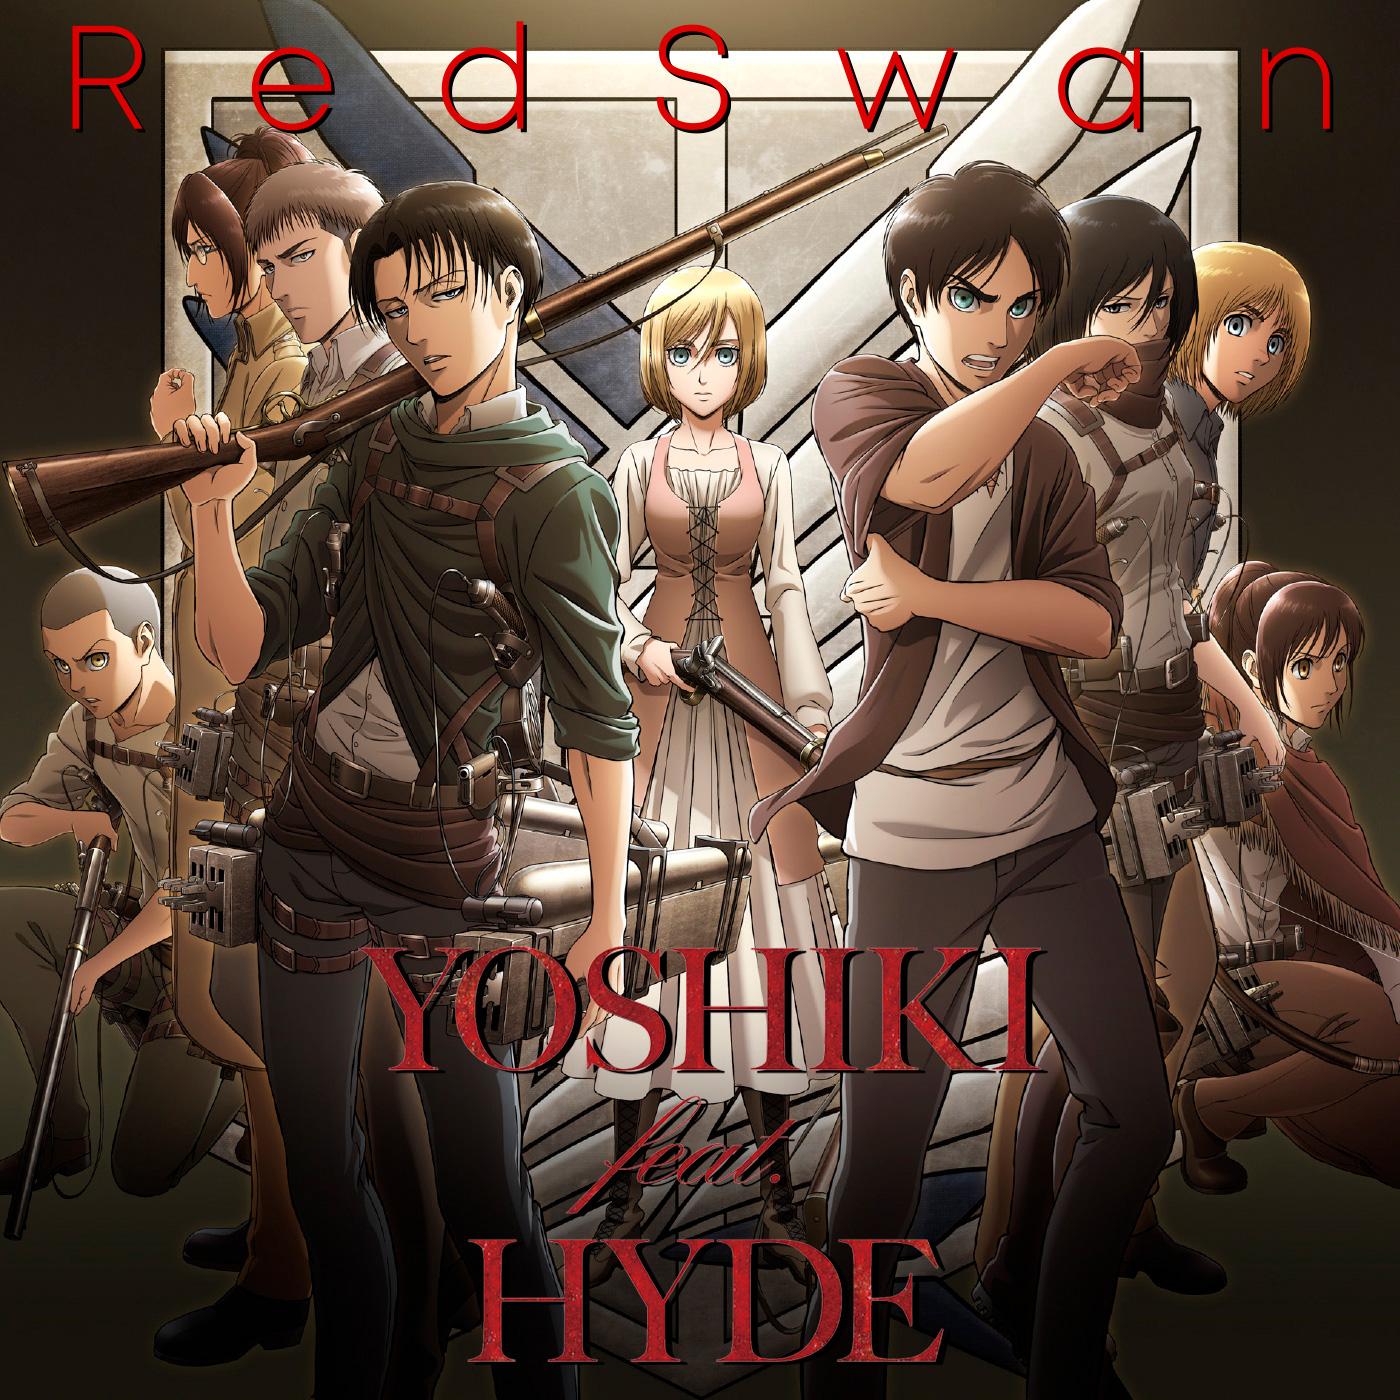 RMMS-Yoshiki-feat-Hyde-Attack-on-Titan-Red-Swan-promo1